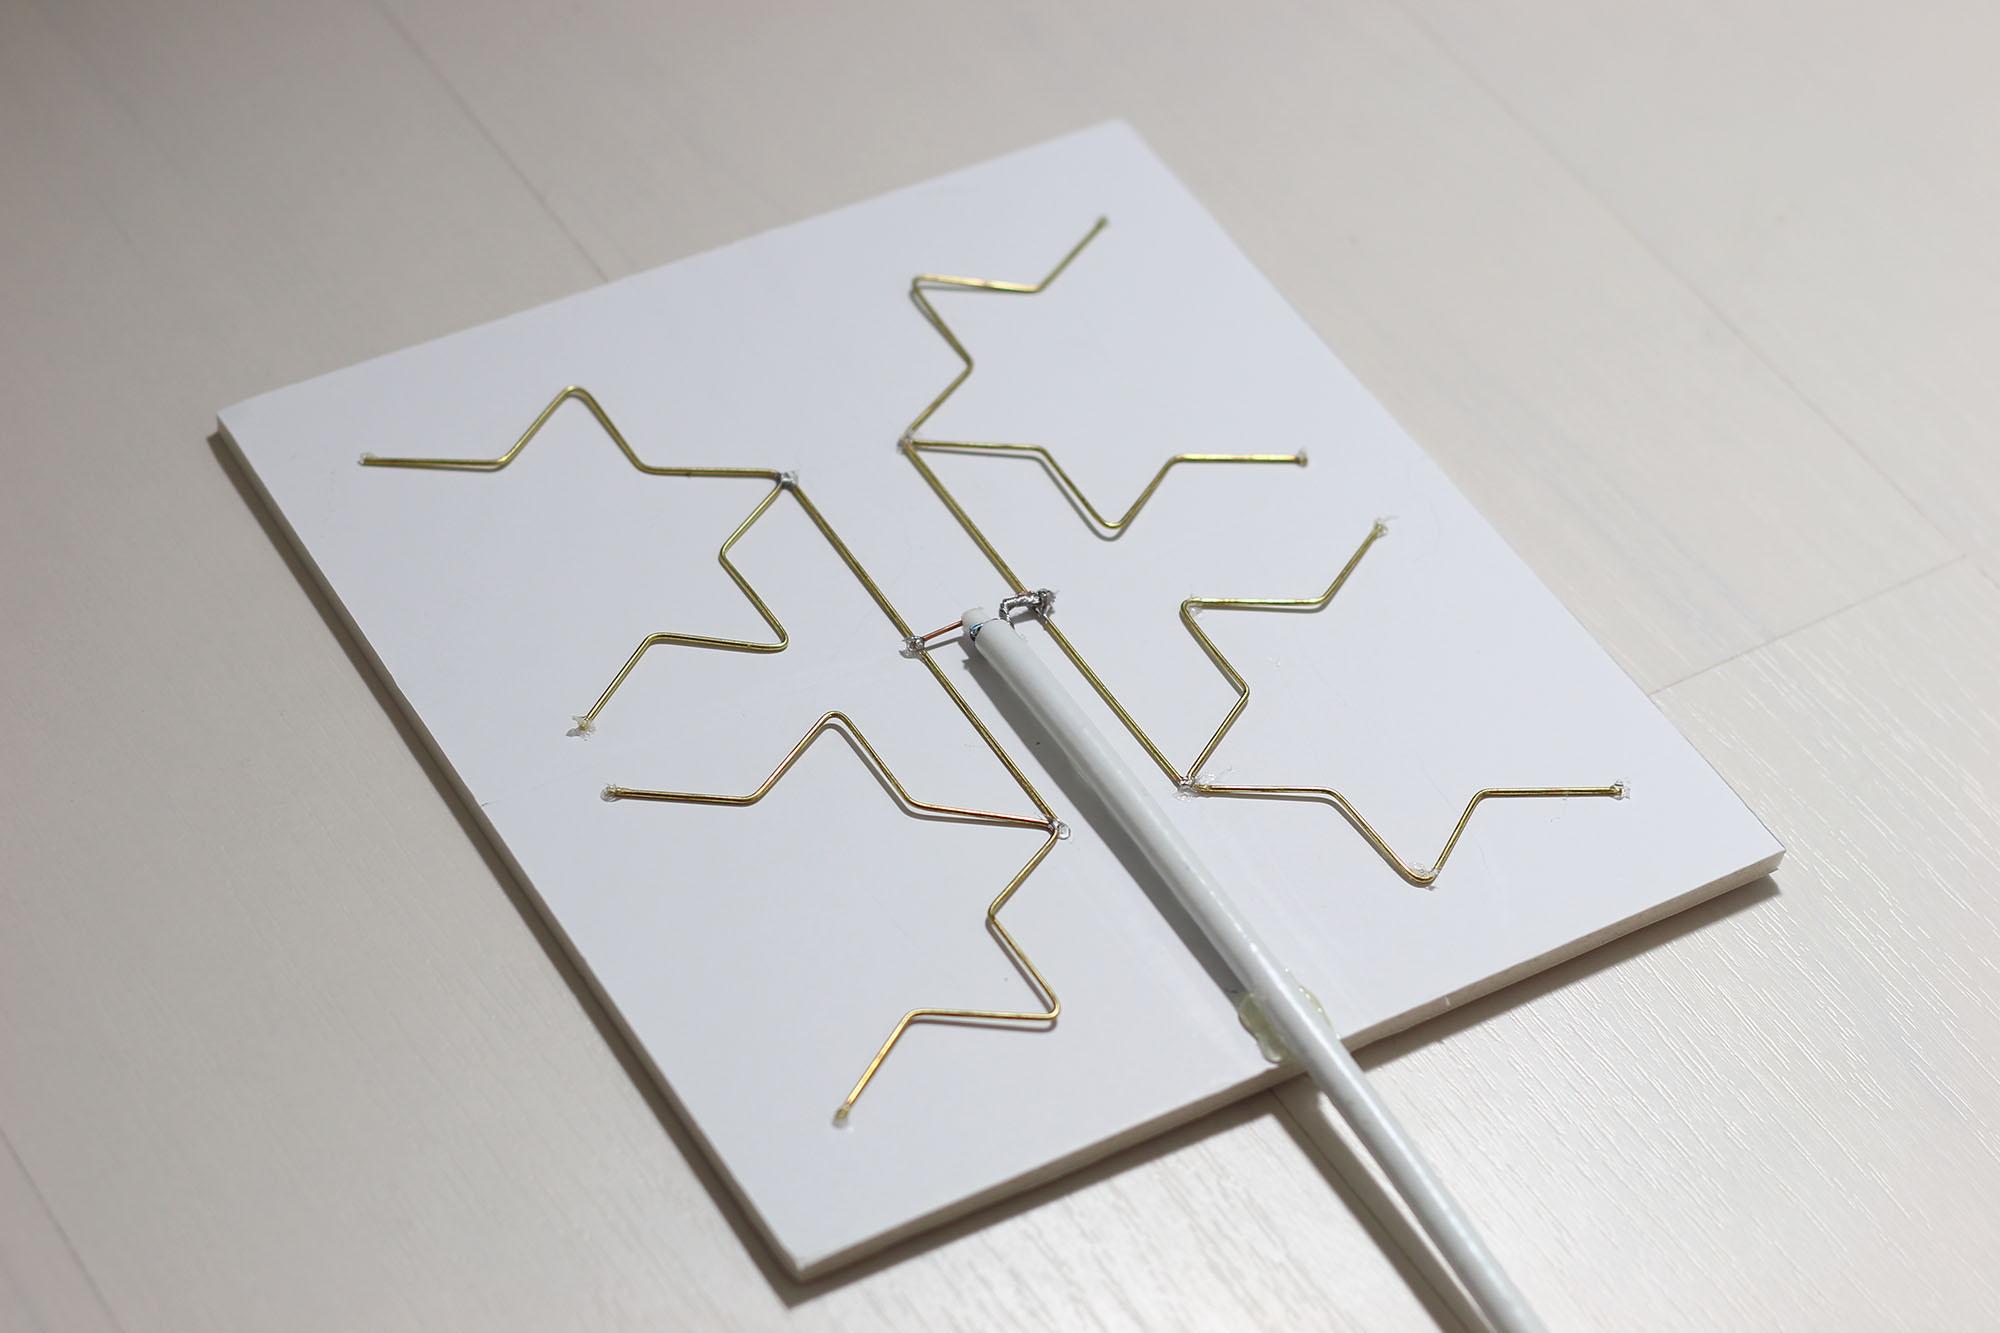 DIY Fractal Antenna